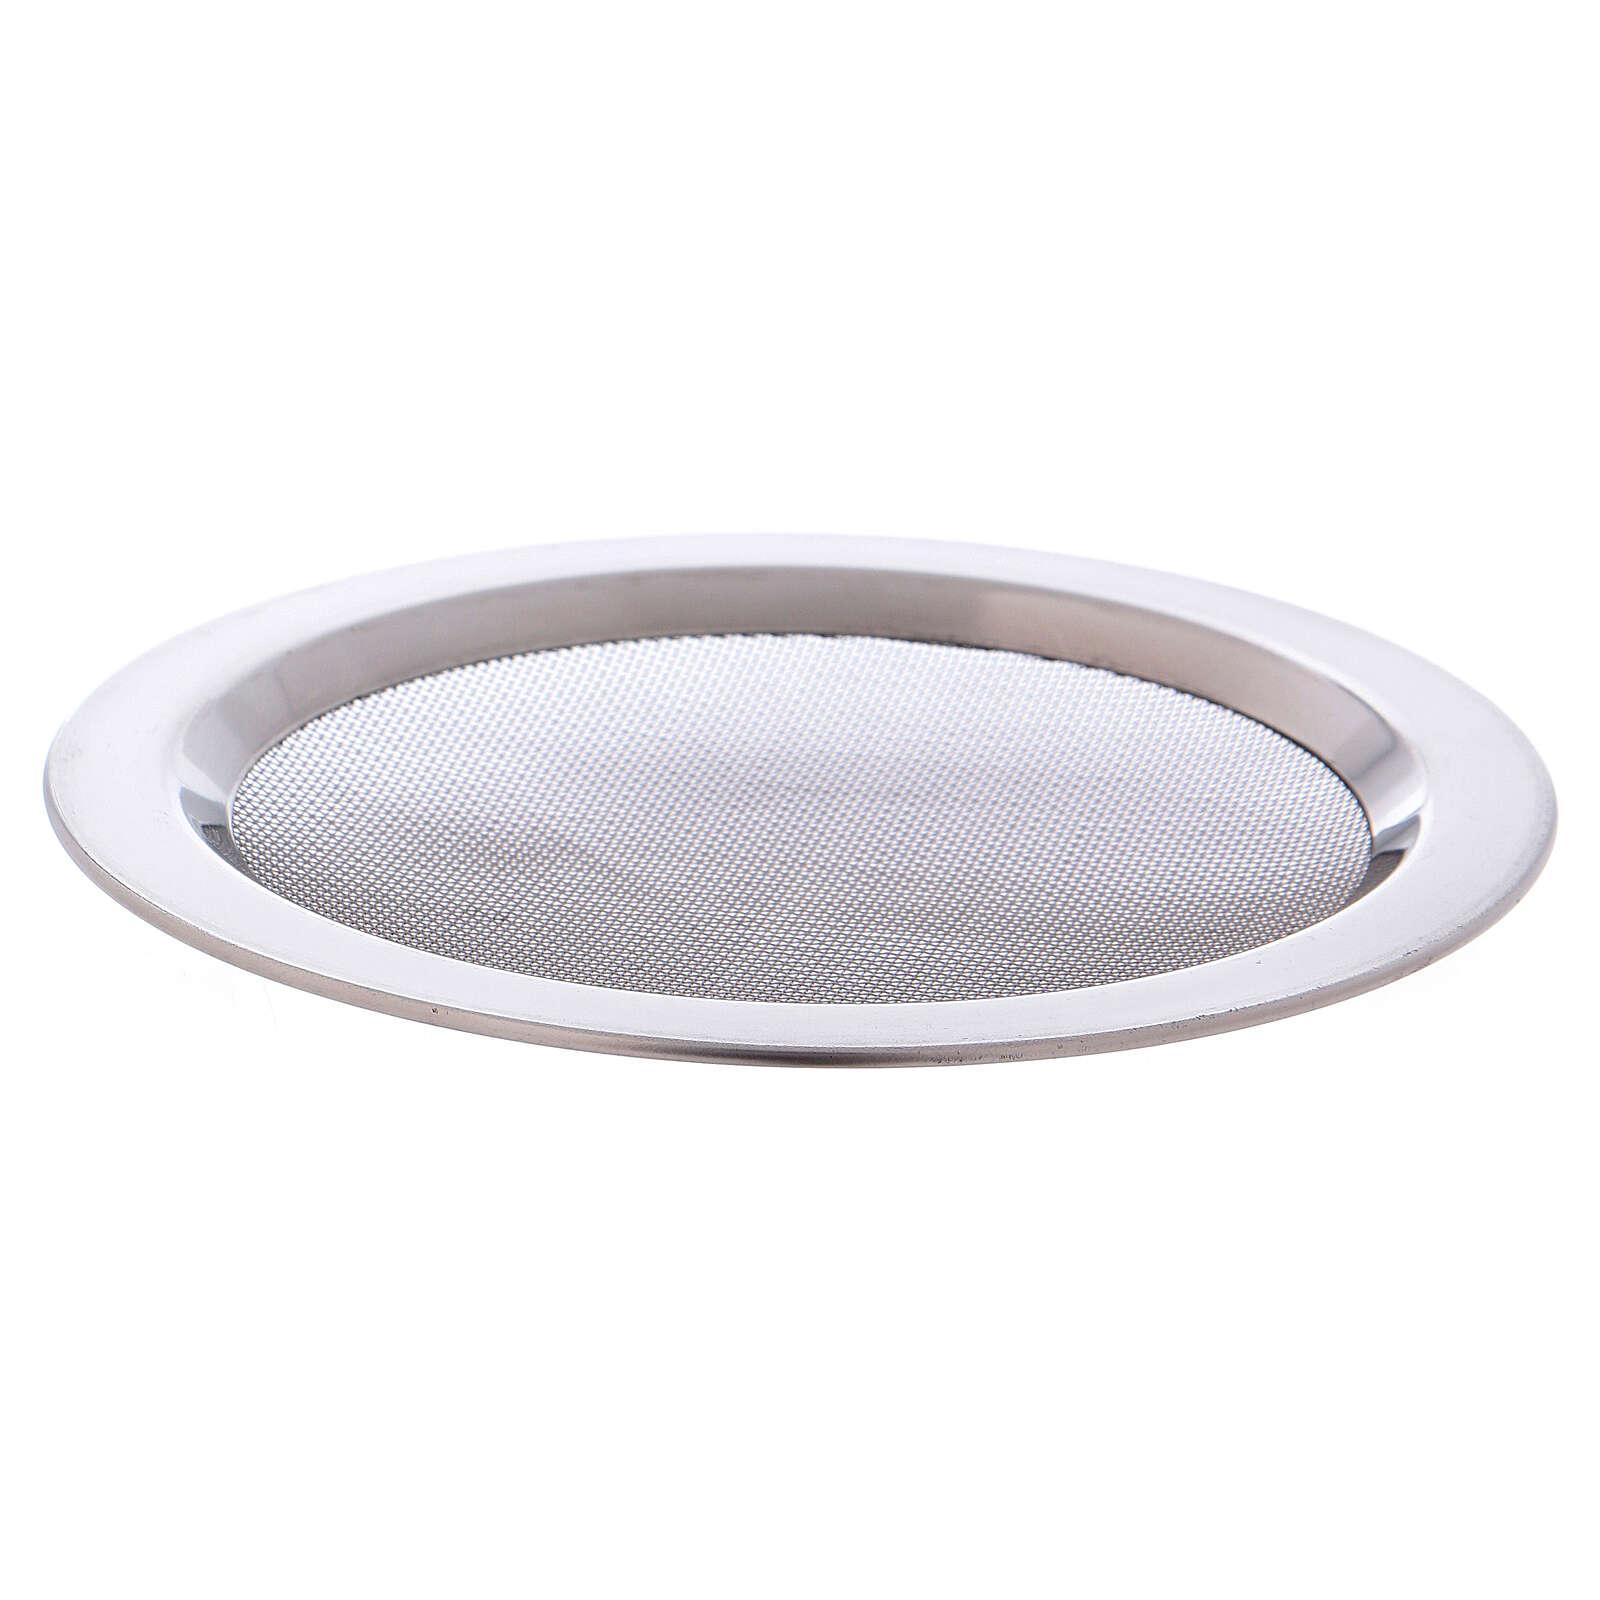 Spare net for incense burner silver-colored polish steel diam. 4 3/4 in 3